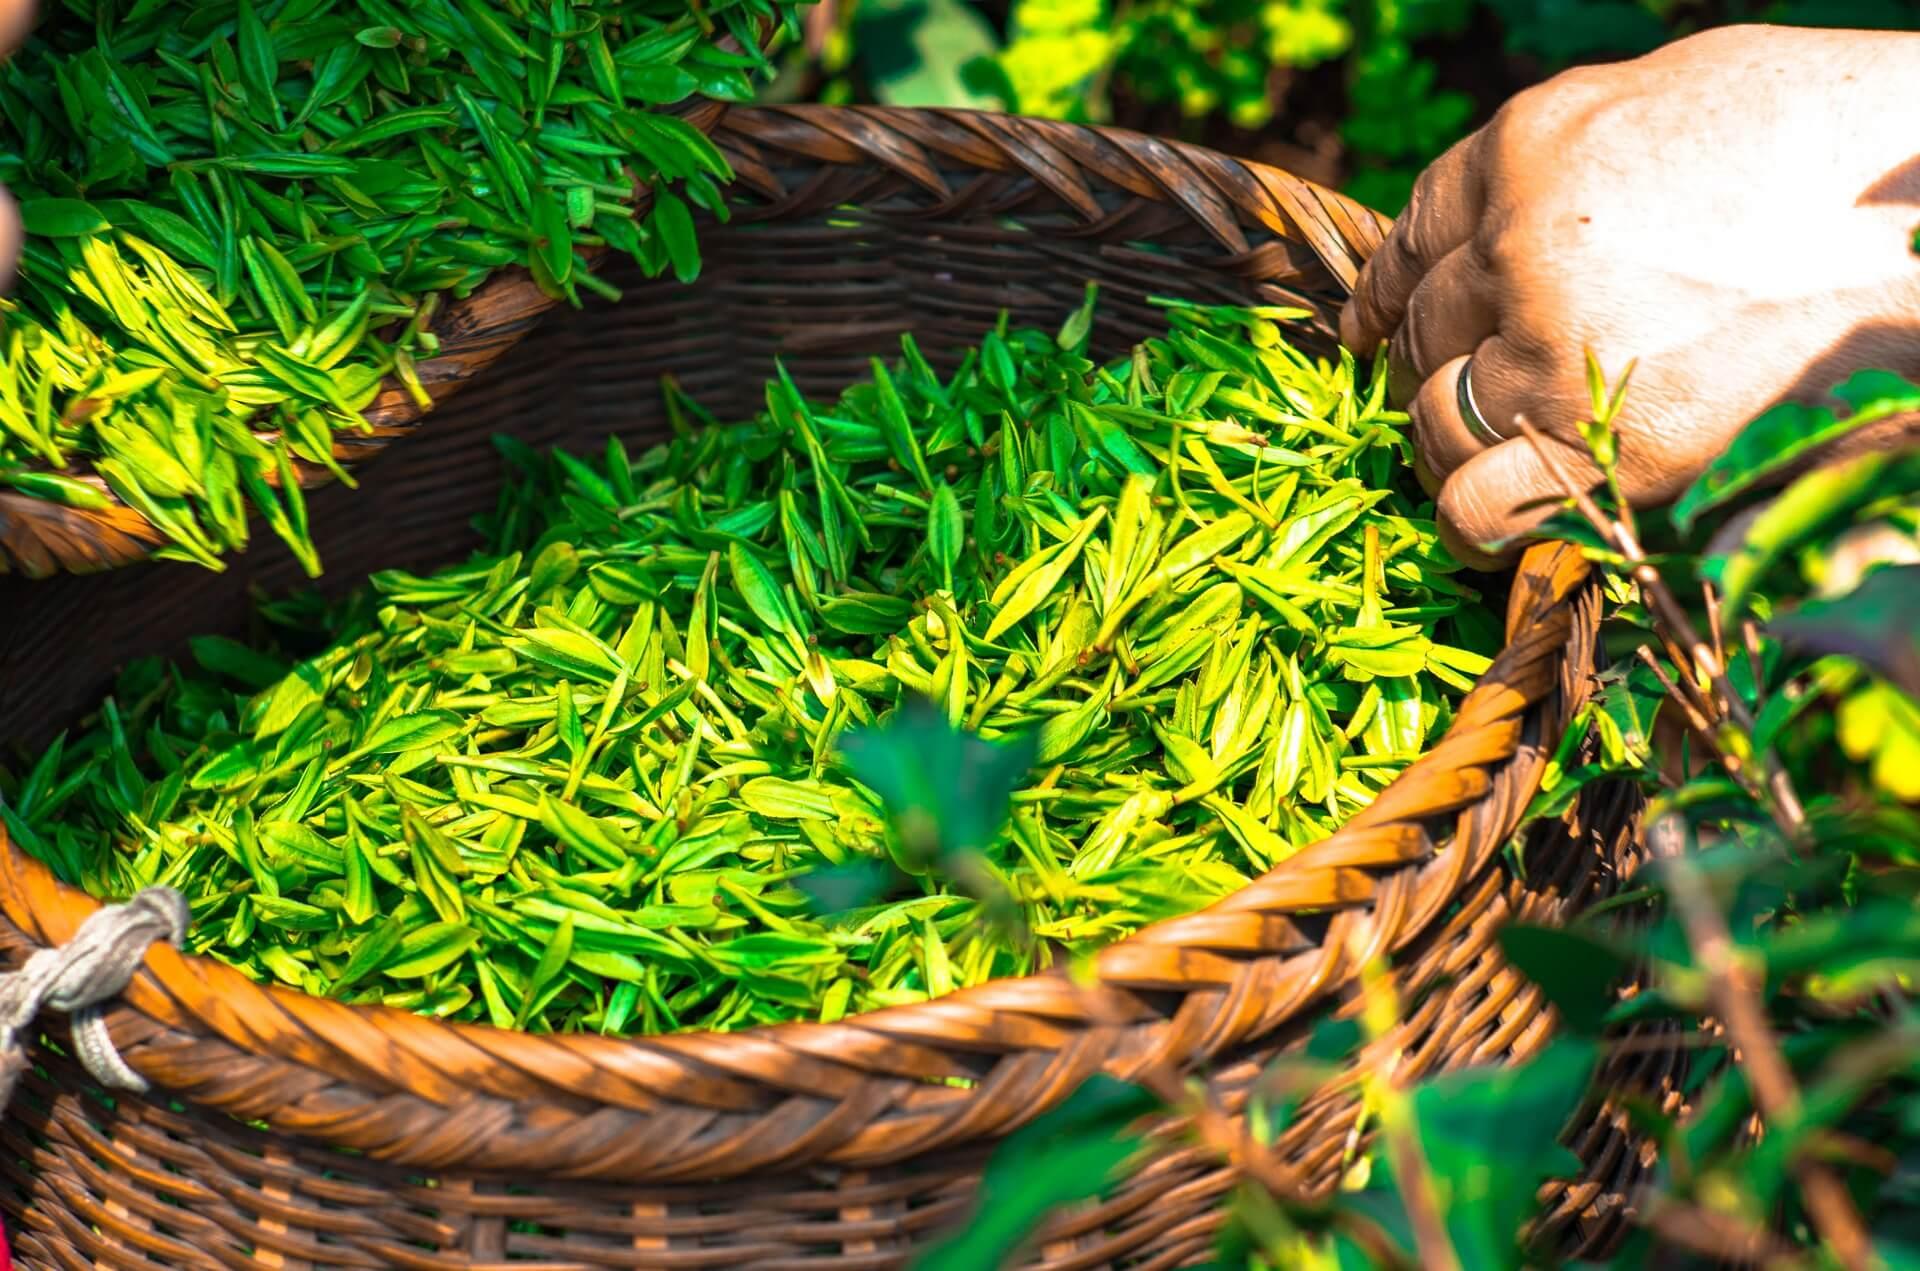 Chá verde logo após a colheita